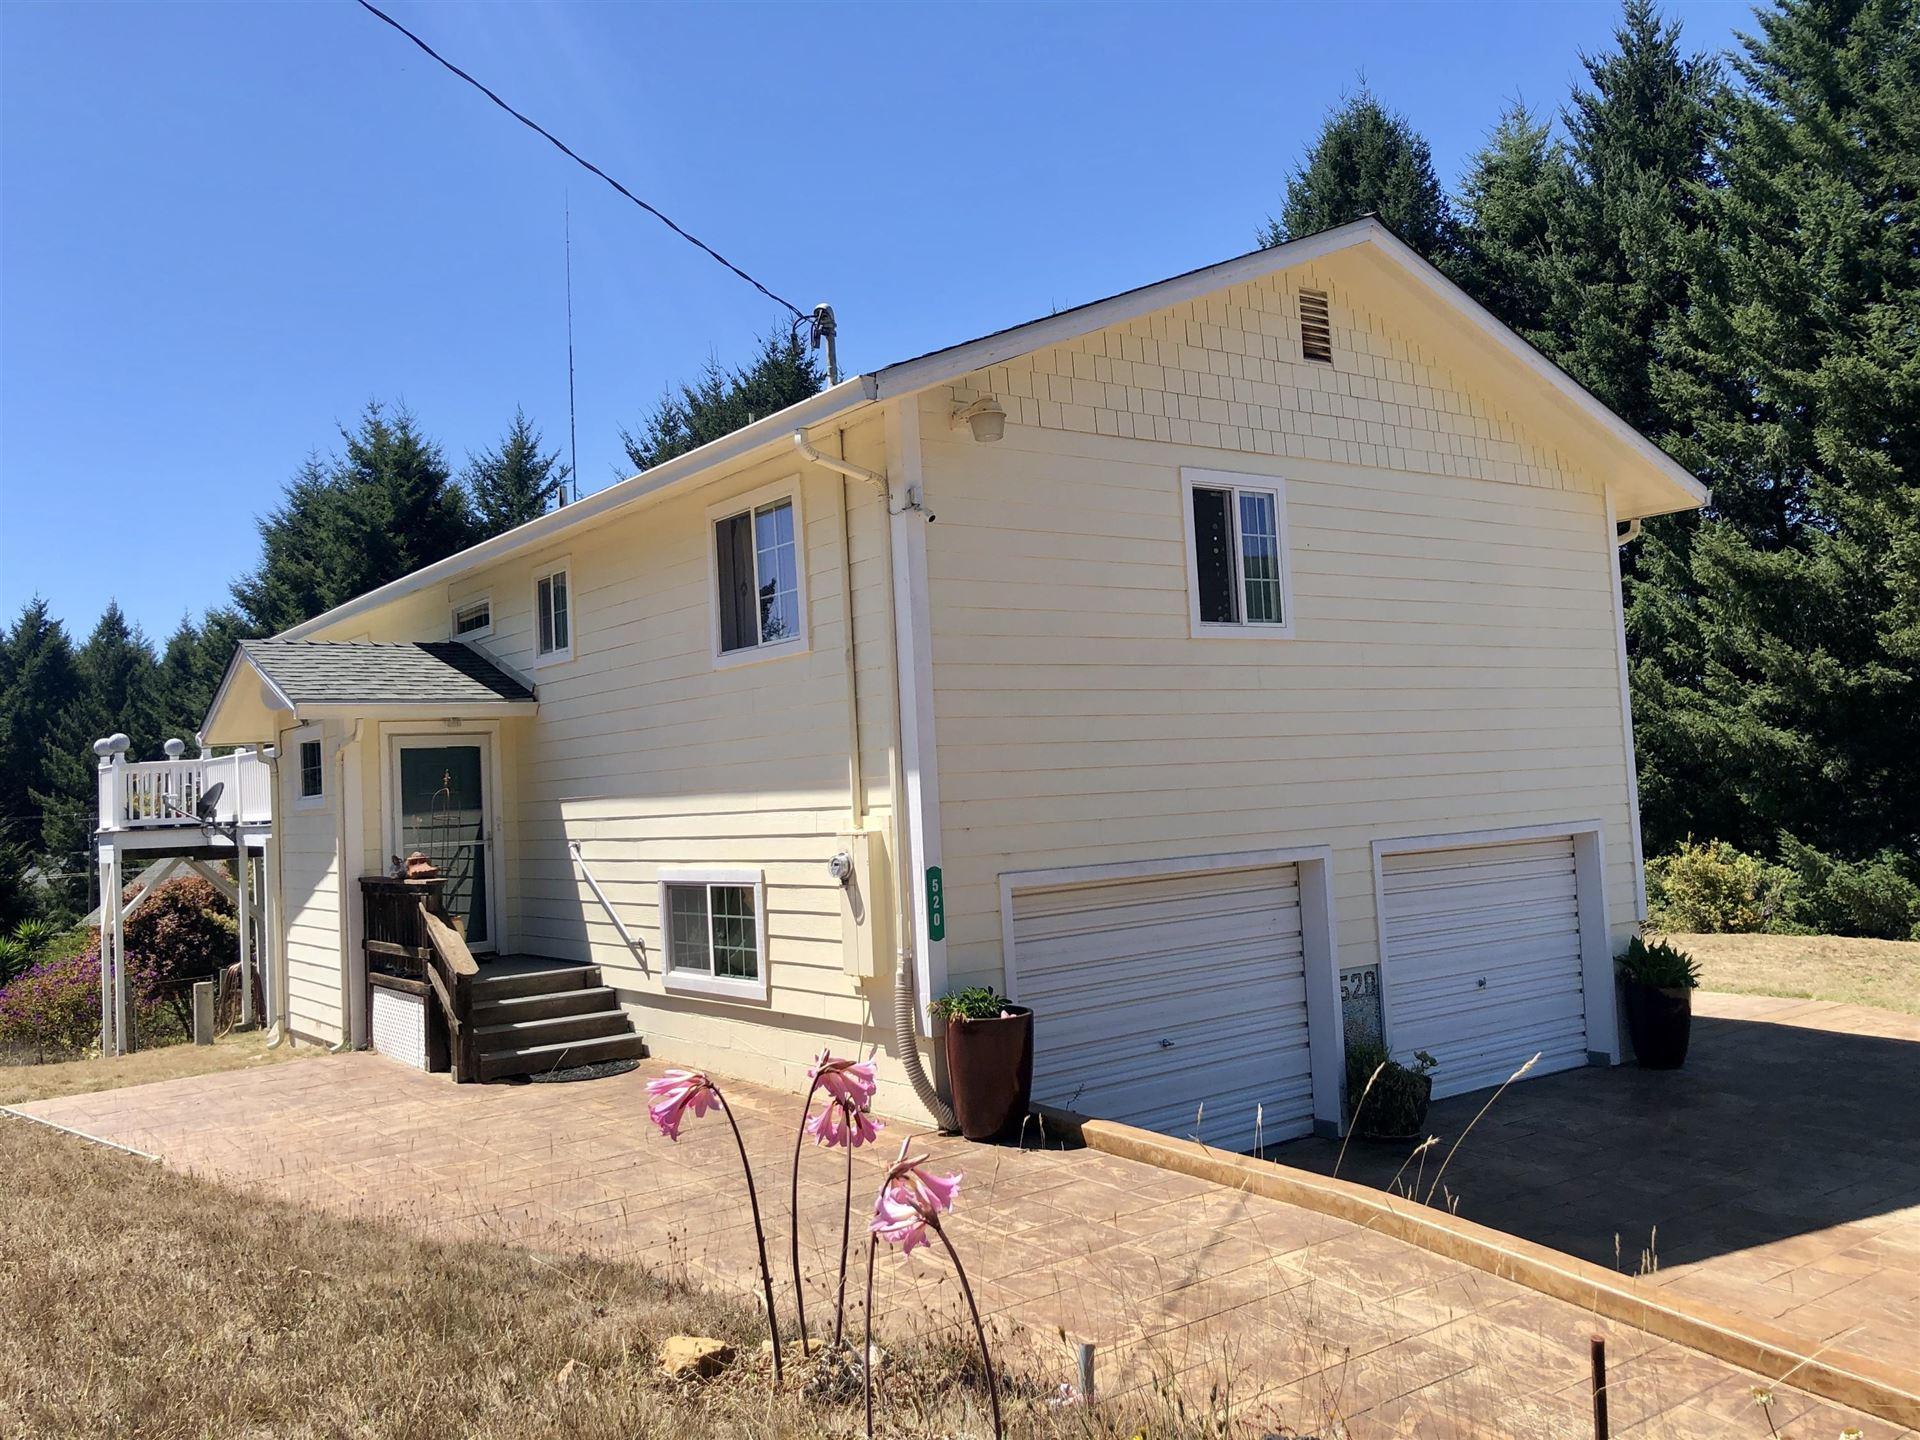 520 Redwood Road, Shelter Cove, CA 95589 - MLS#: 259861